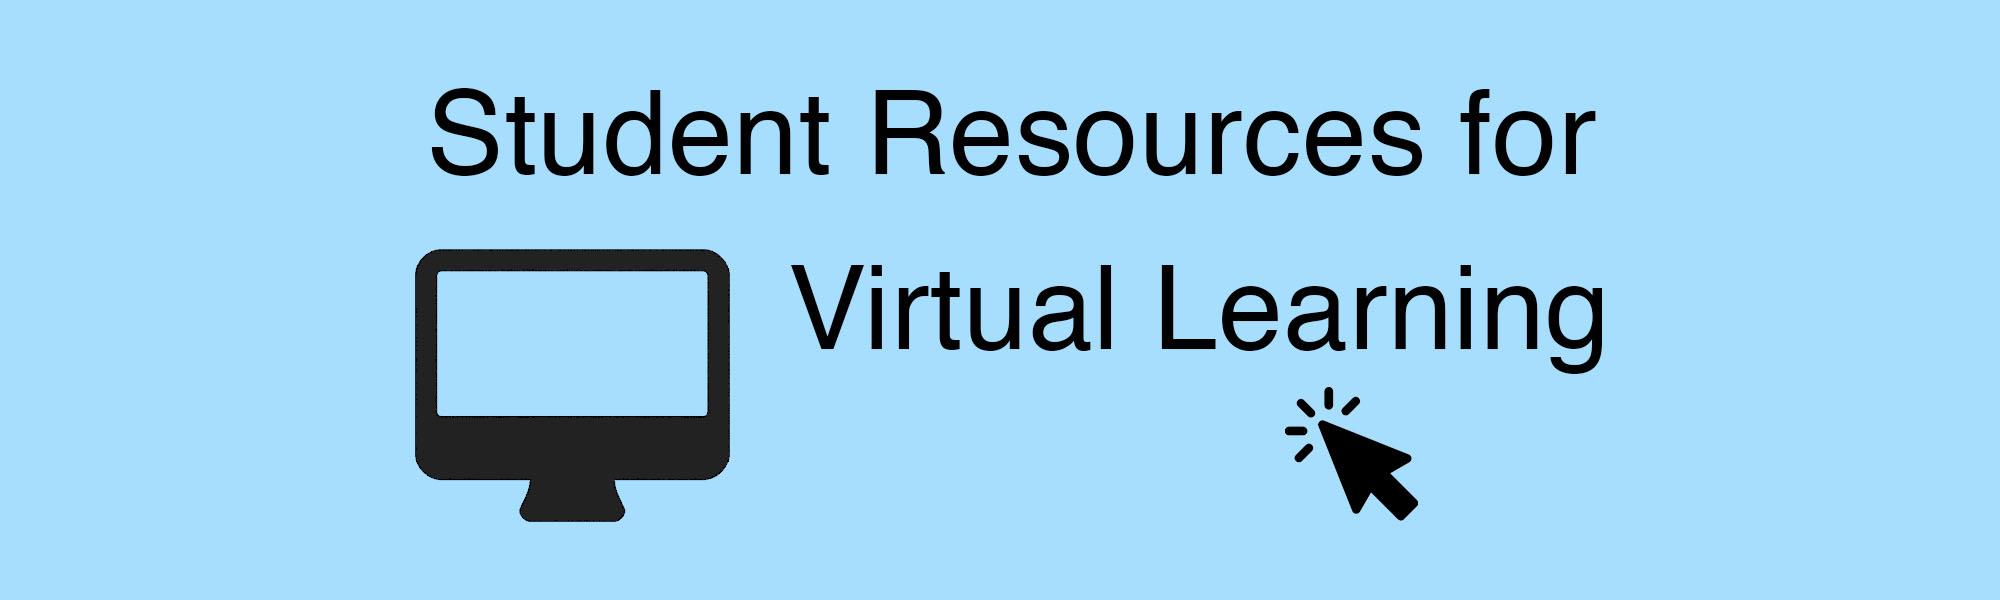 SDSU Virtual Learning Resources